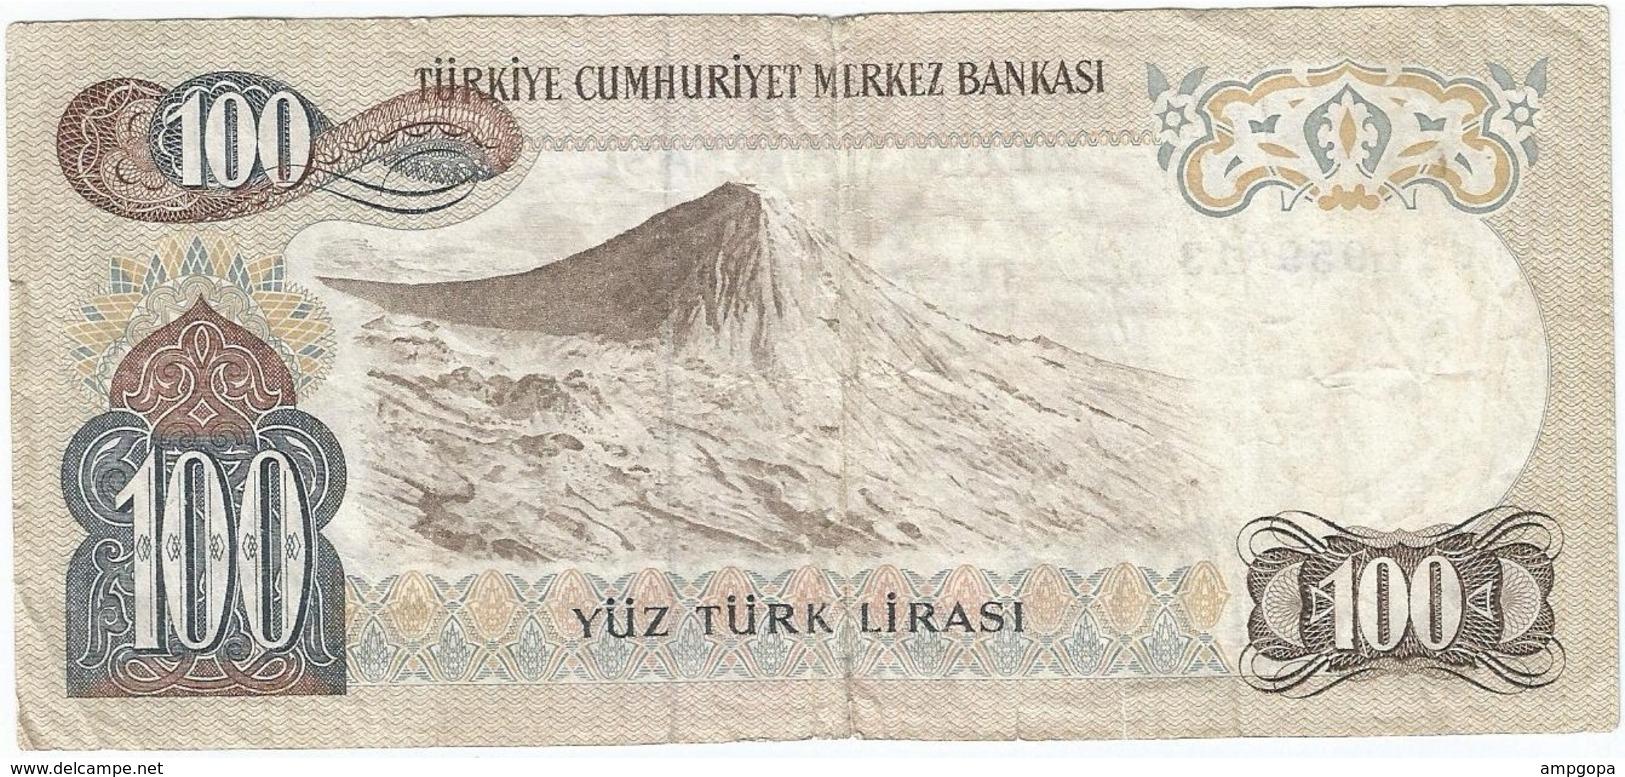 Turquía - Turkey 100 Lirasi 1983 Pk 189 C Firmas Siklar-Haseki Ref 475 - Türkei